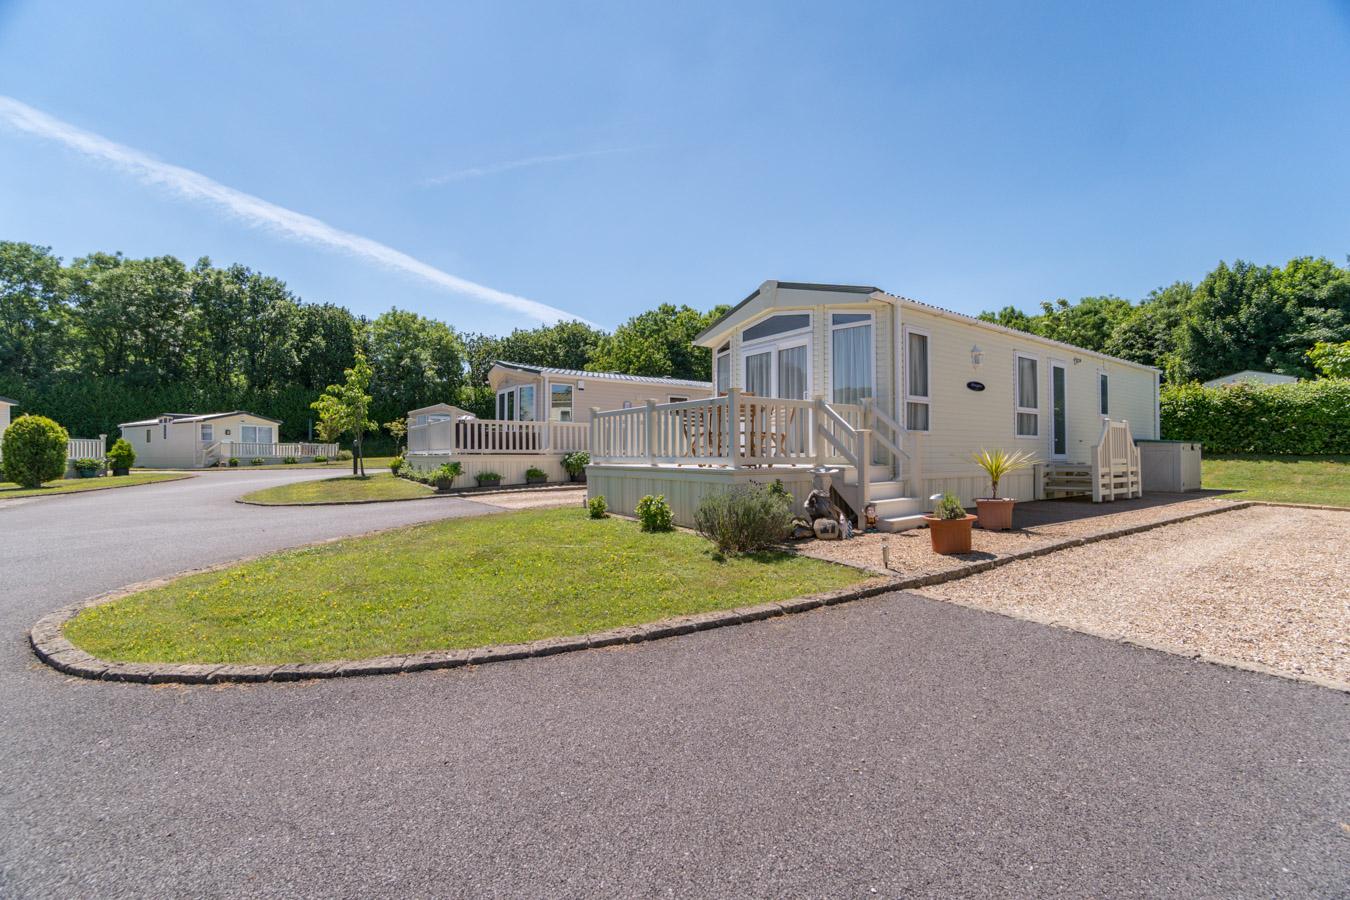 Neil-Bigwood-Monkton-Wyld-Holiday-Homes-04